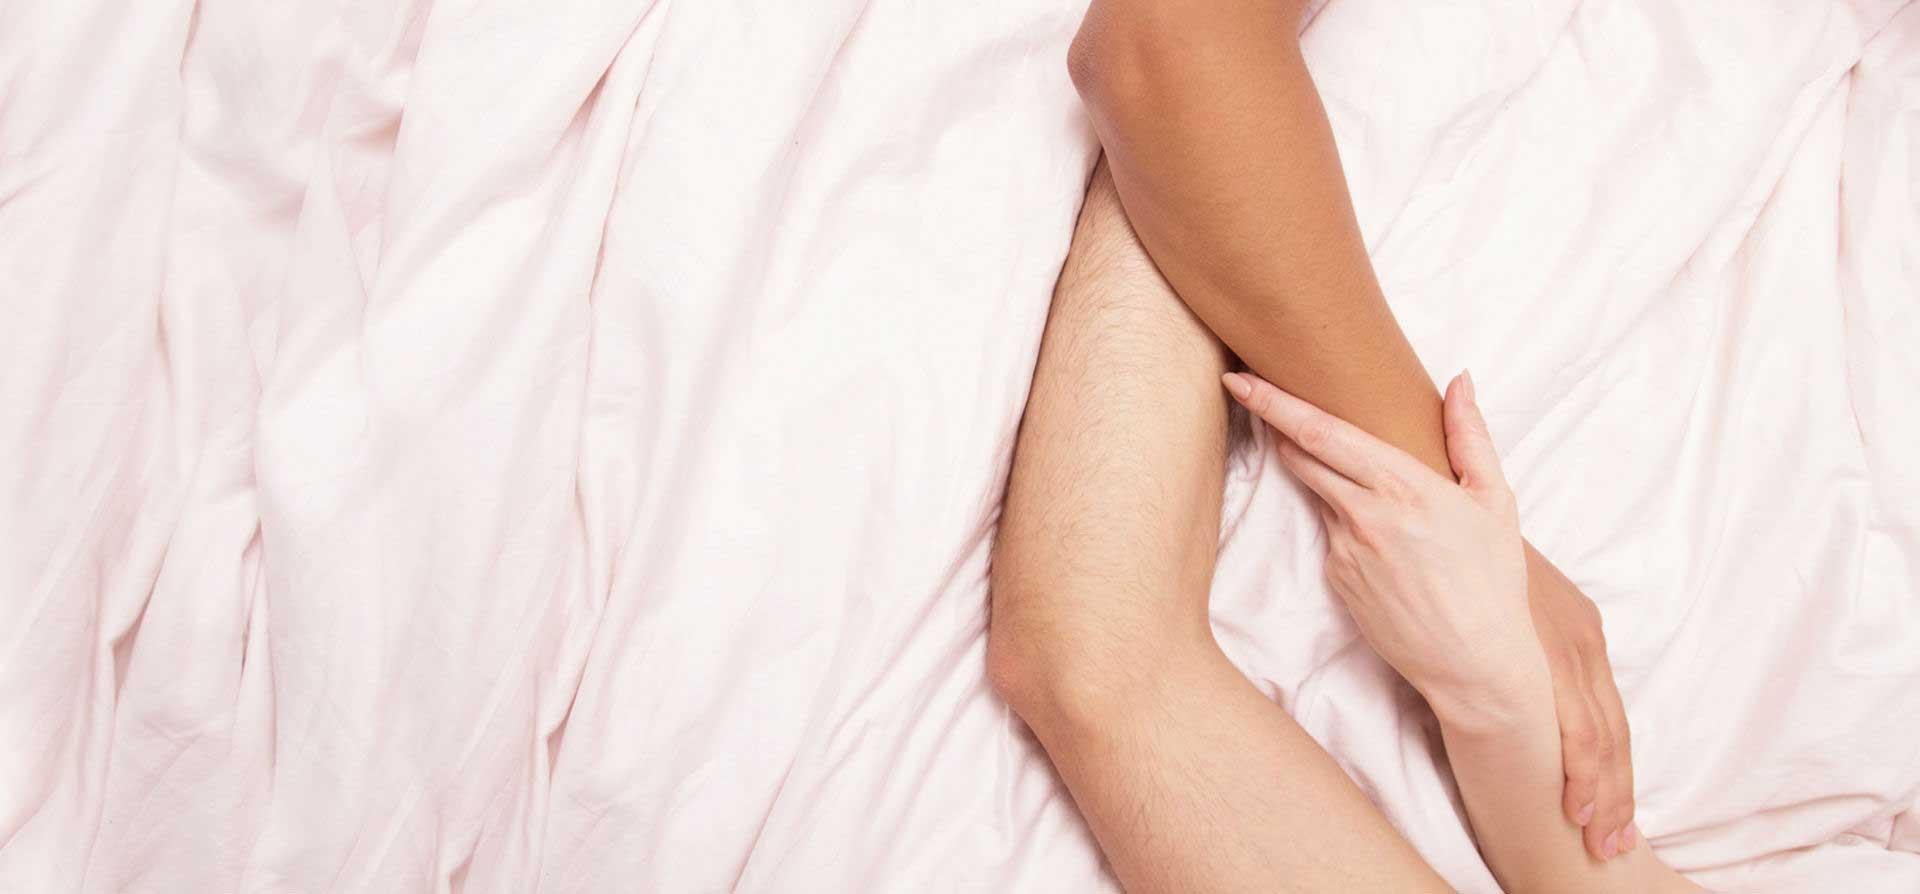 Neue Paartherapie Sexualtherapie